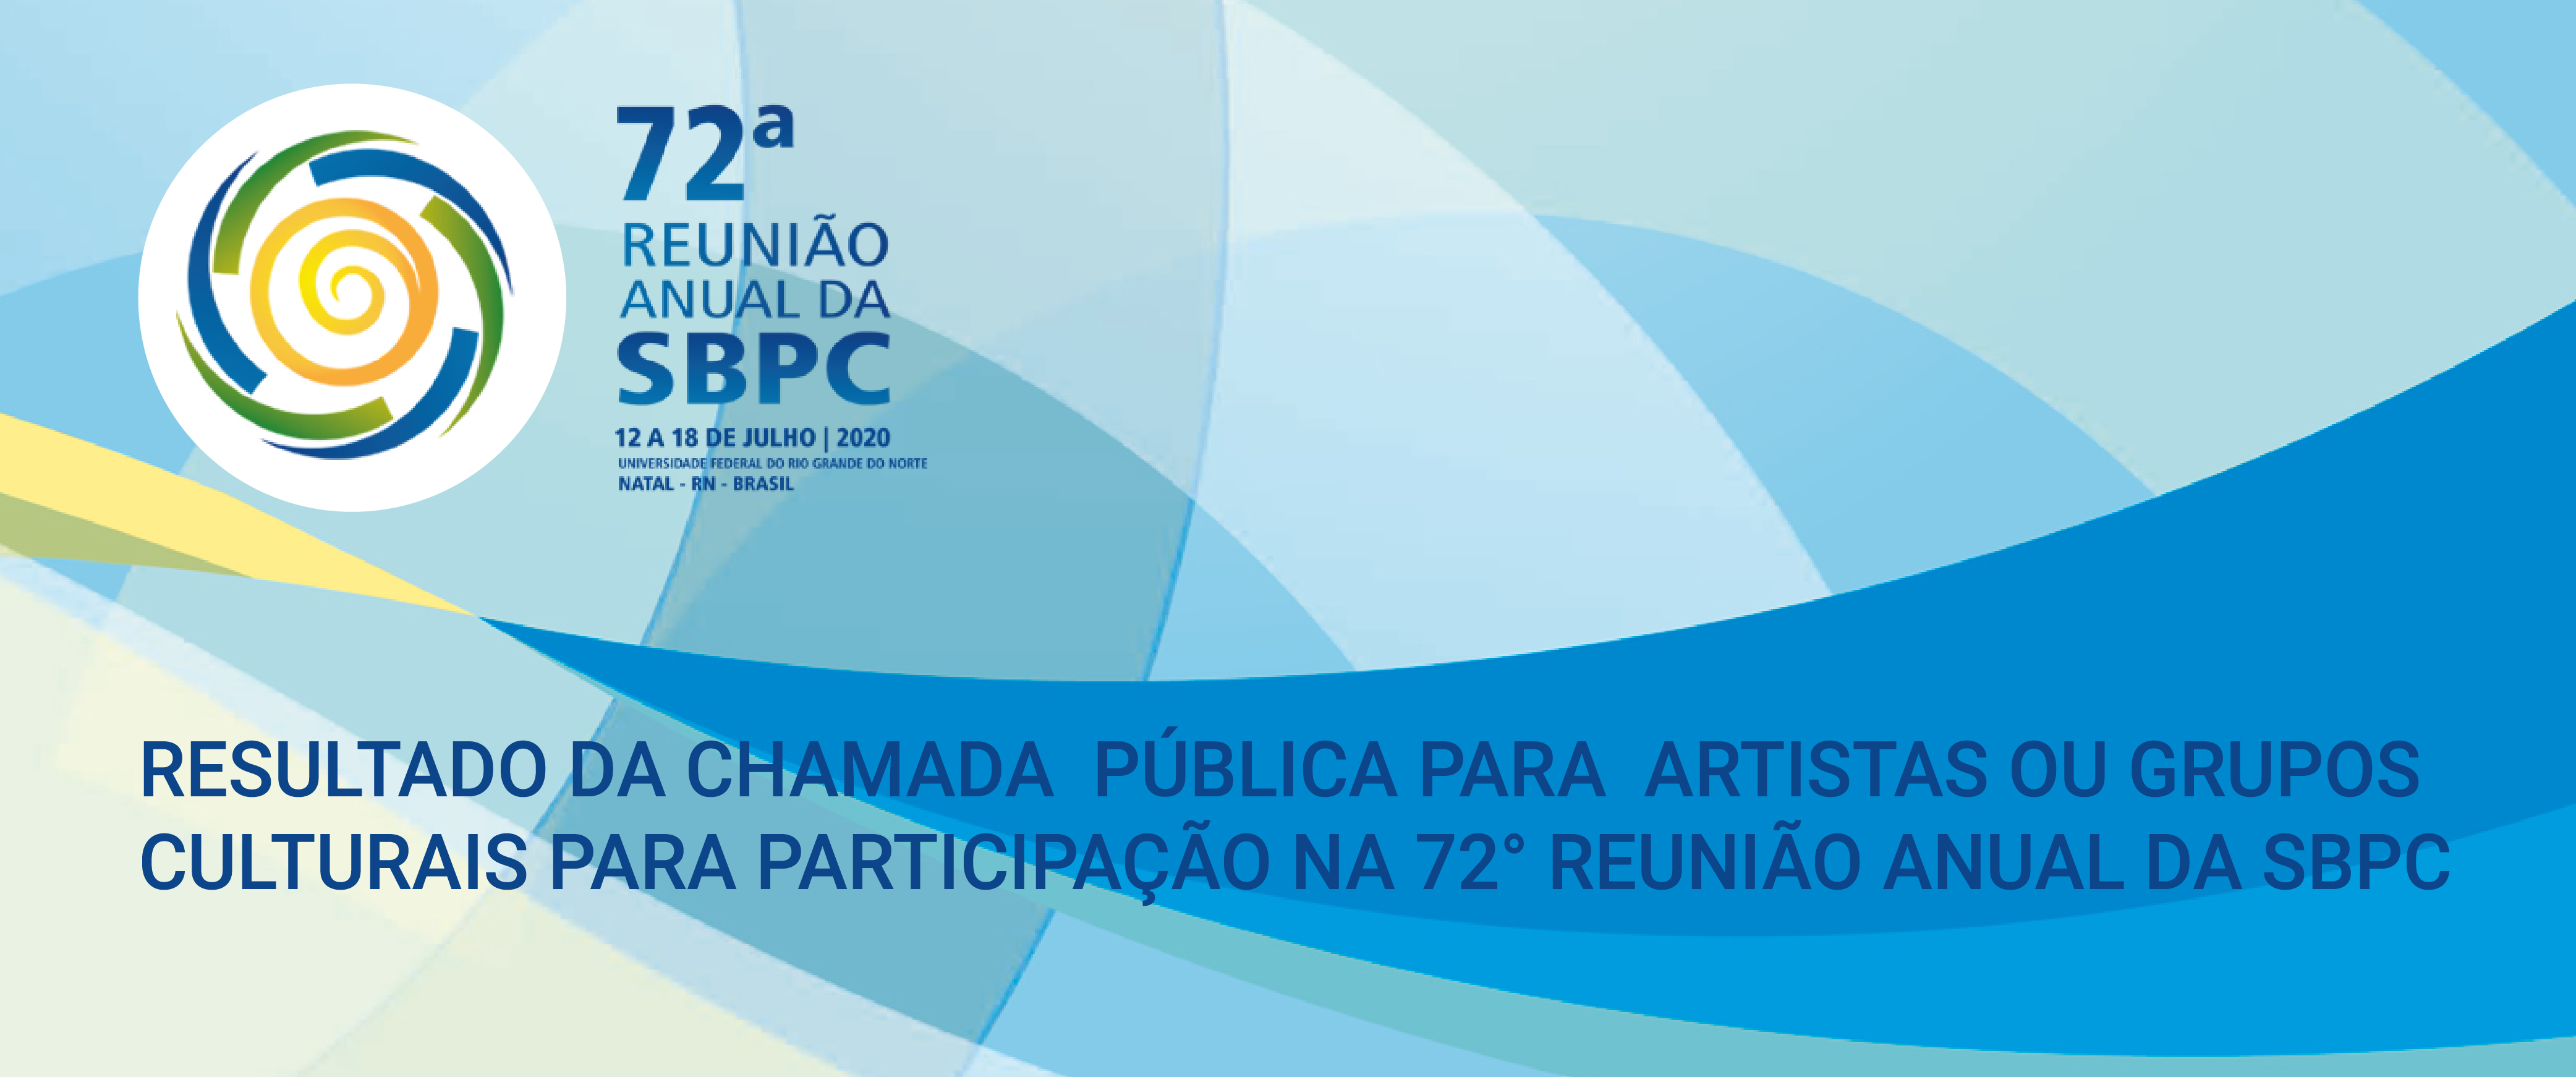 Resultado da chamada da SBPC Cultural